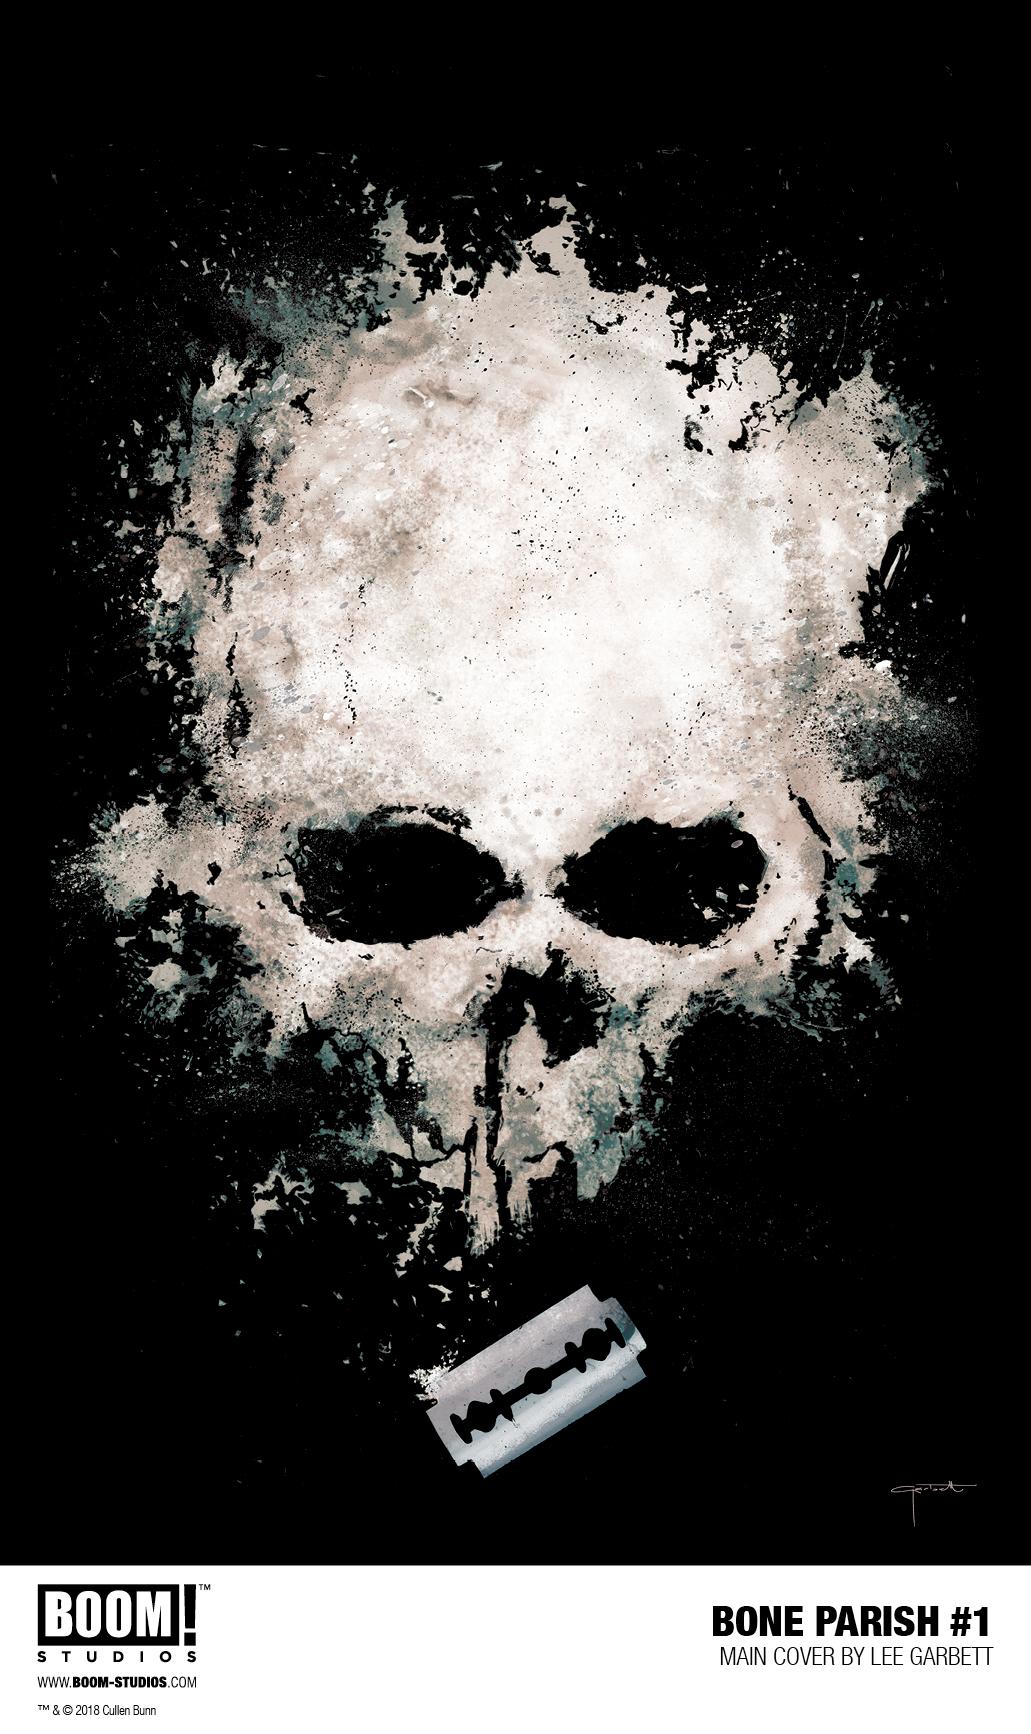 BoneParish_001_Main_PROMO.jpg